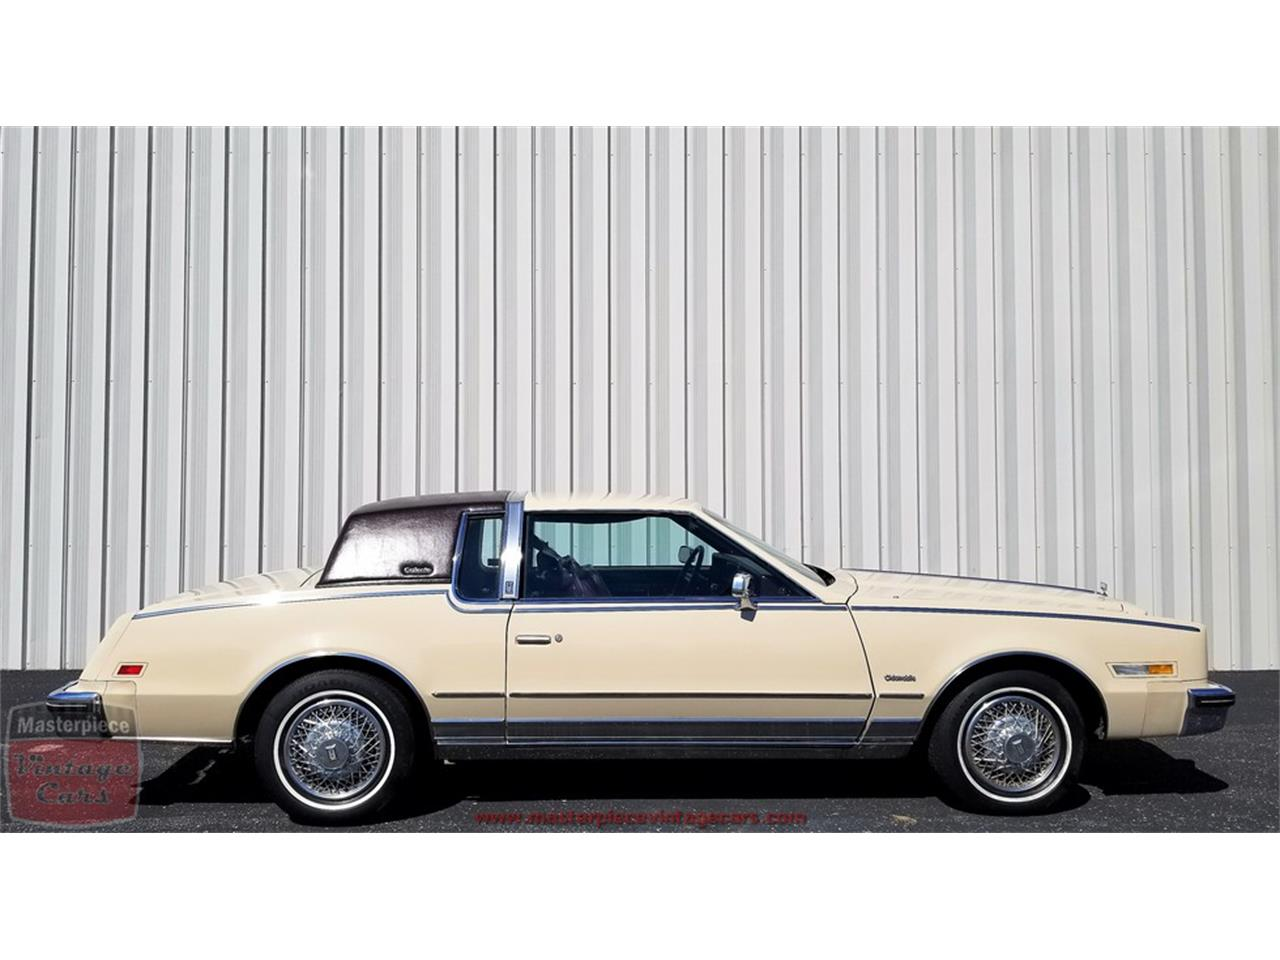 Large Picture of '85 Oldsmobile Toronado located in Indiana - $5,950.00 - Q4ZA